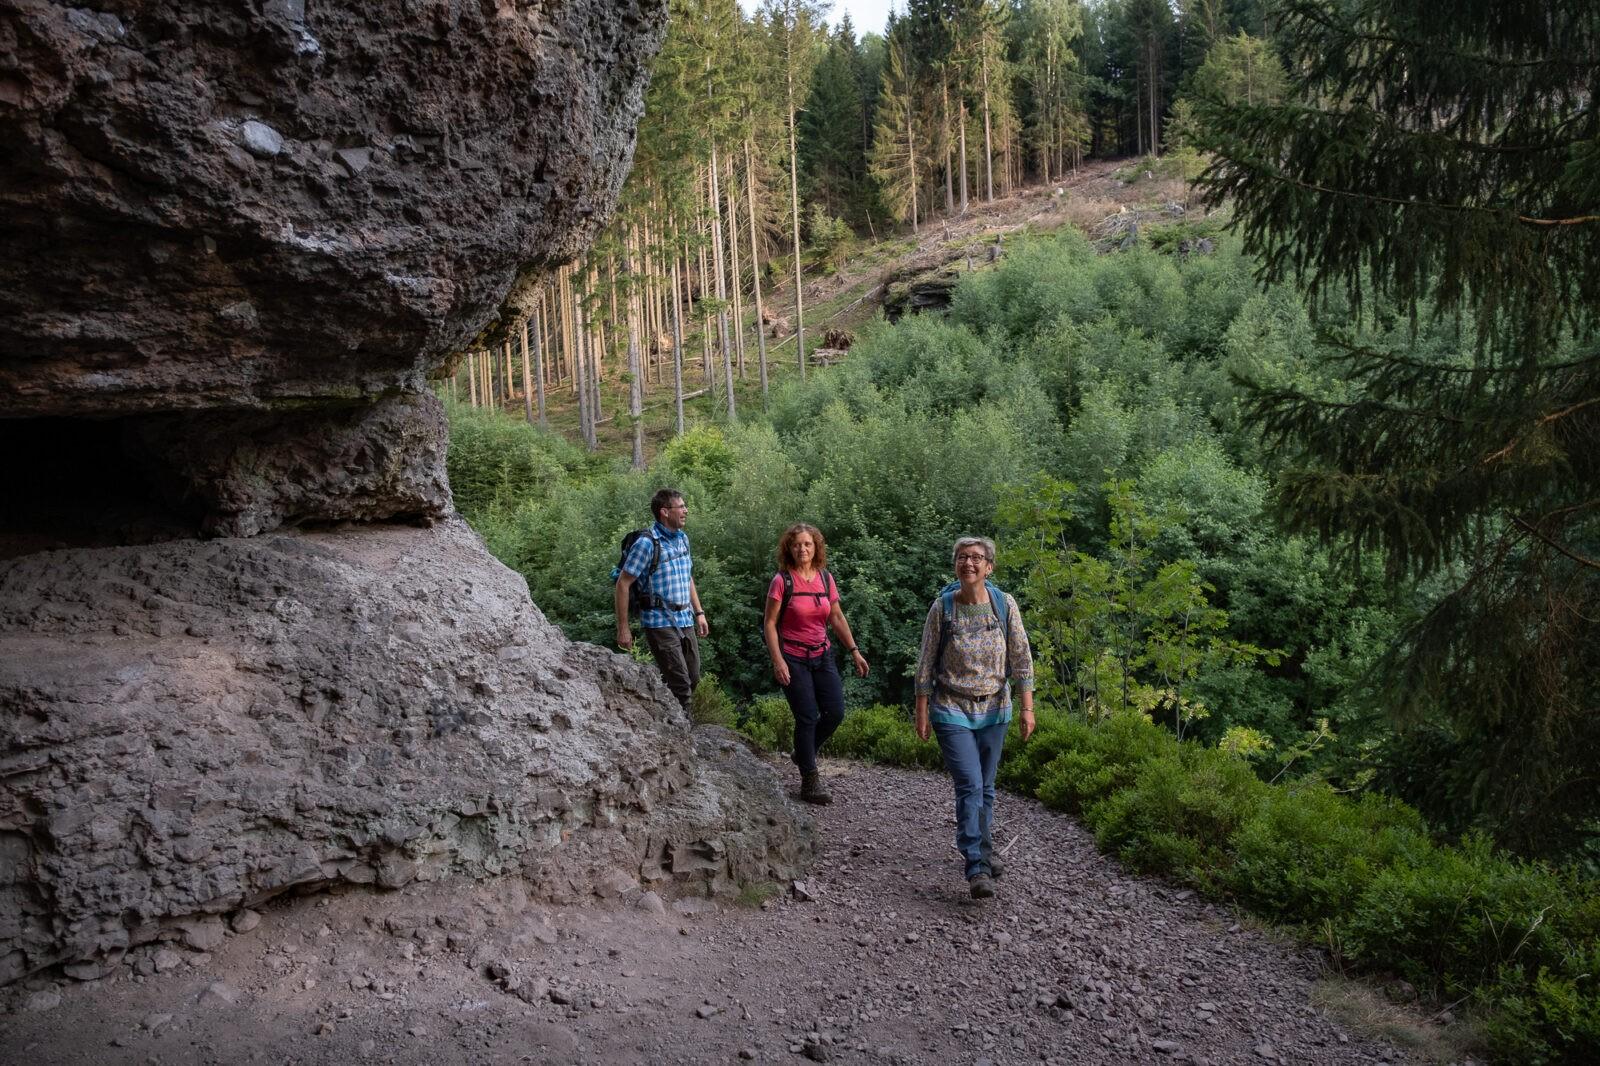 Wanderung Am Hülloch bei Tambach-Dietharz | Foto: Lisa Kristin Schrötter